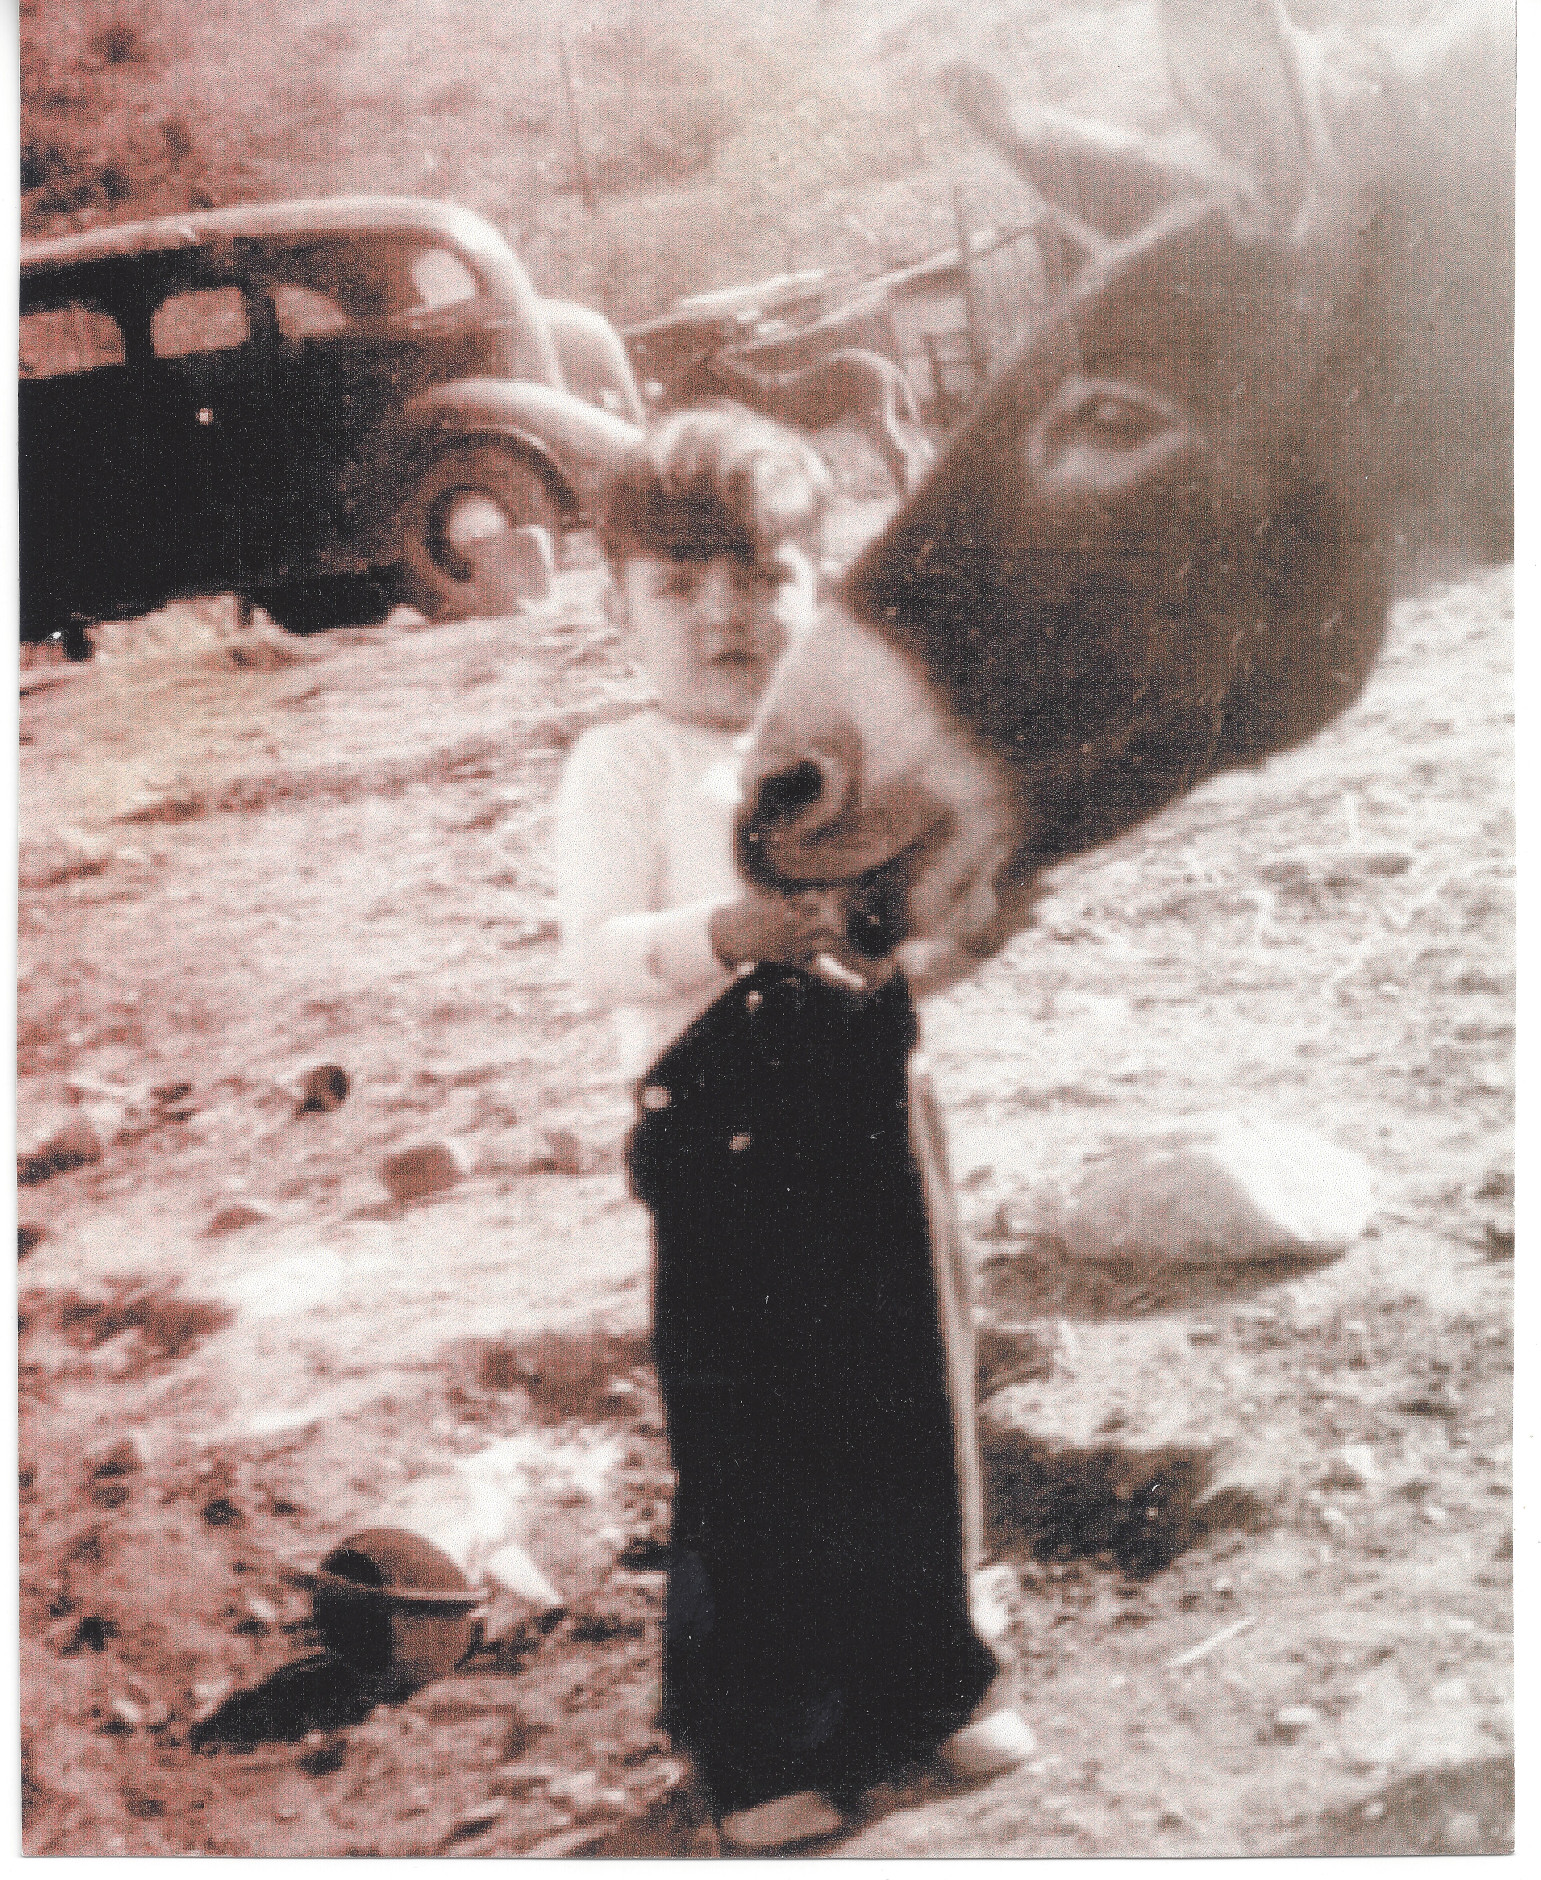 Skip WIlson with Donkey 1